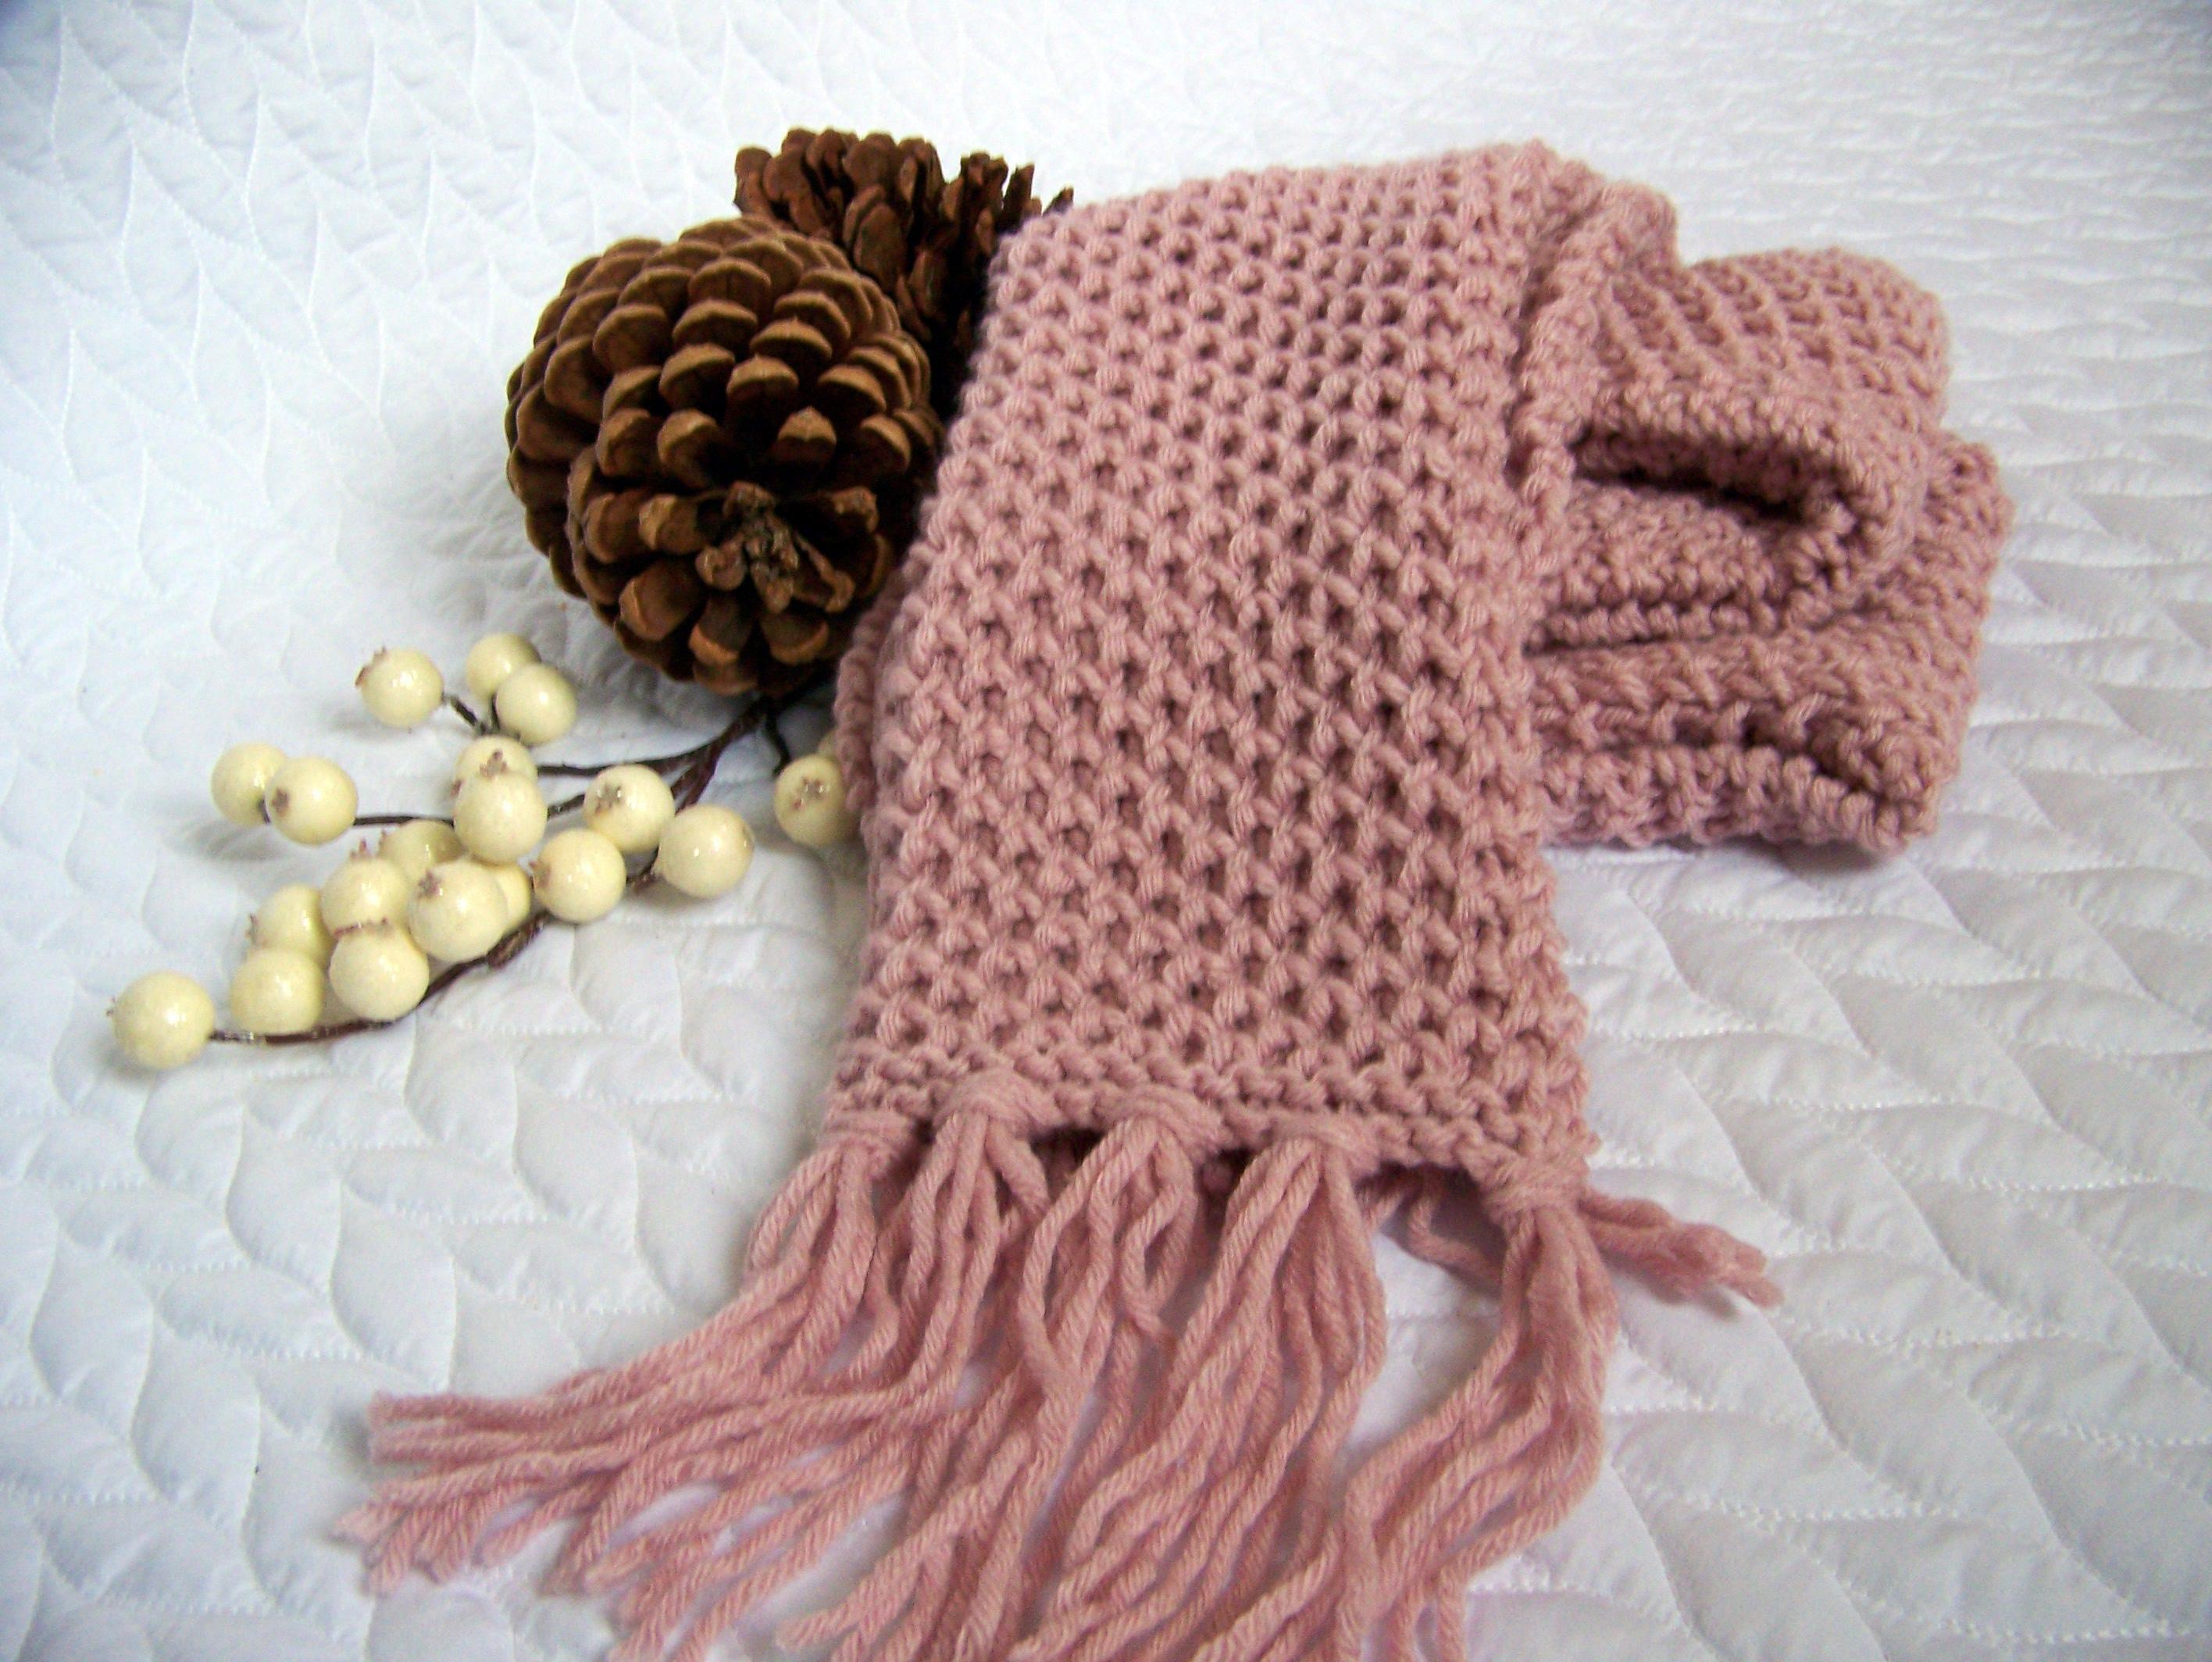 knitting pattern, Chunky Scarf, Pale Blush, knit scarf pattern, long ...